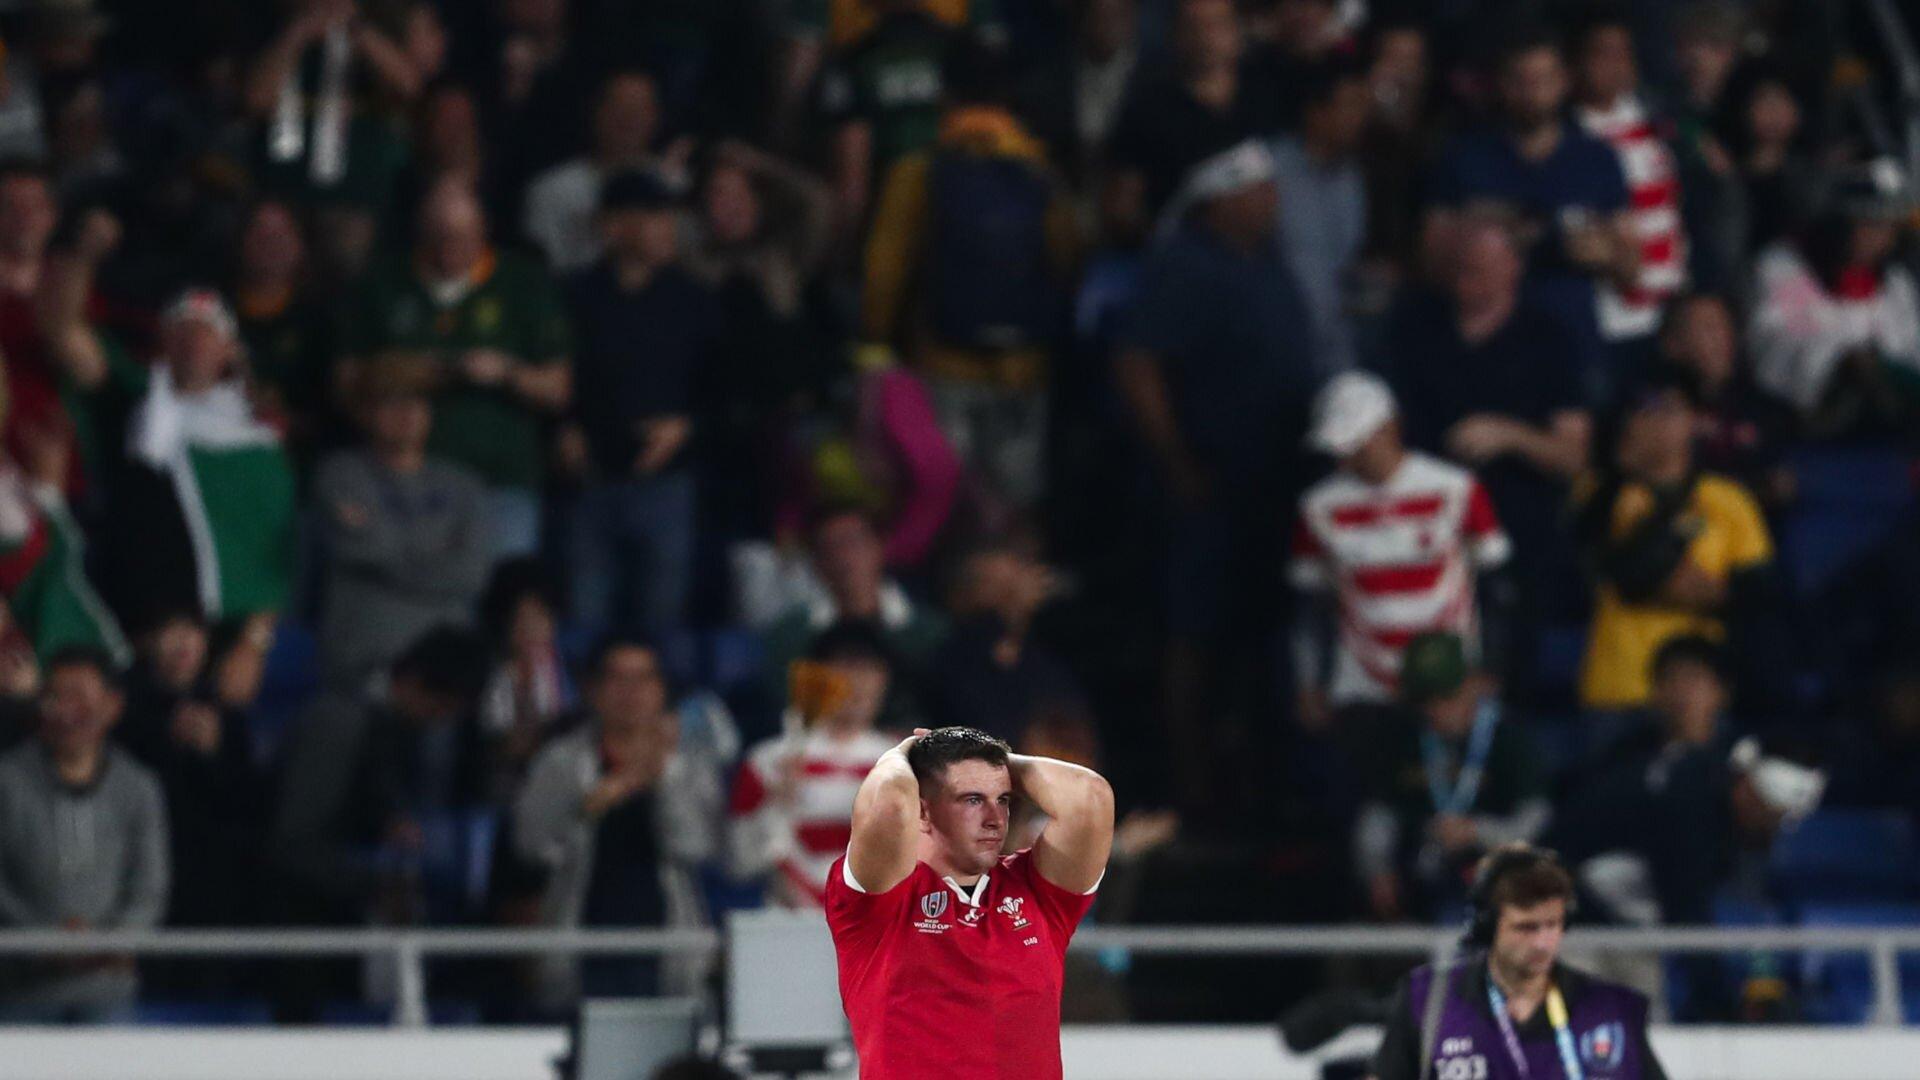 'You want to be a British Lion, you want to be a 100-cap Welsh international' - Owen Watkin